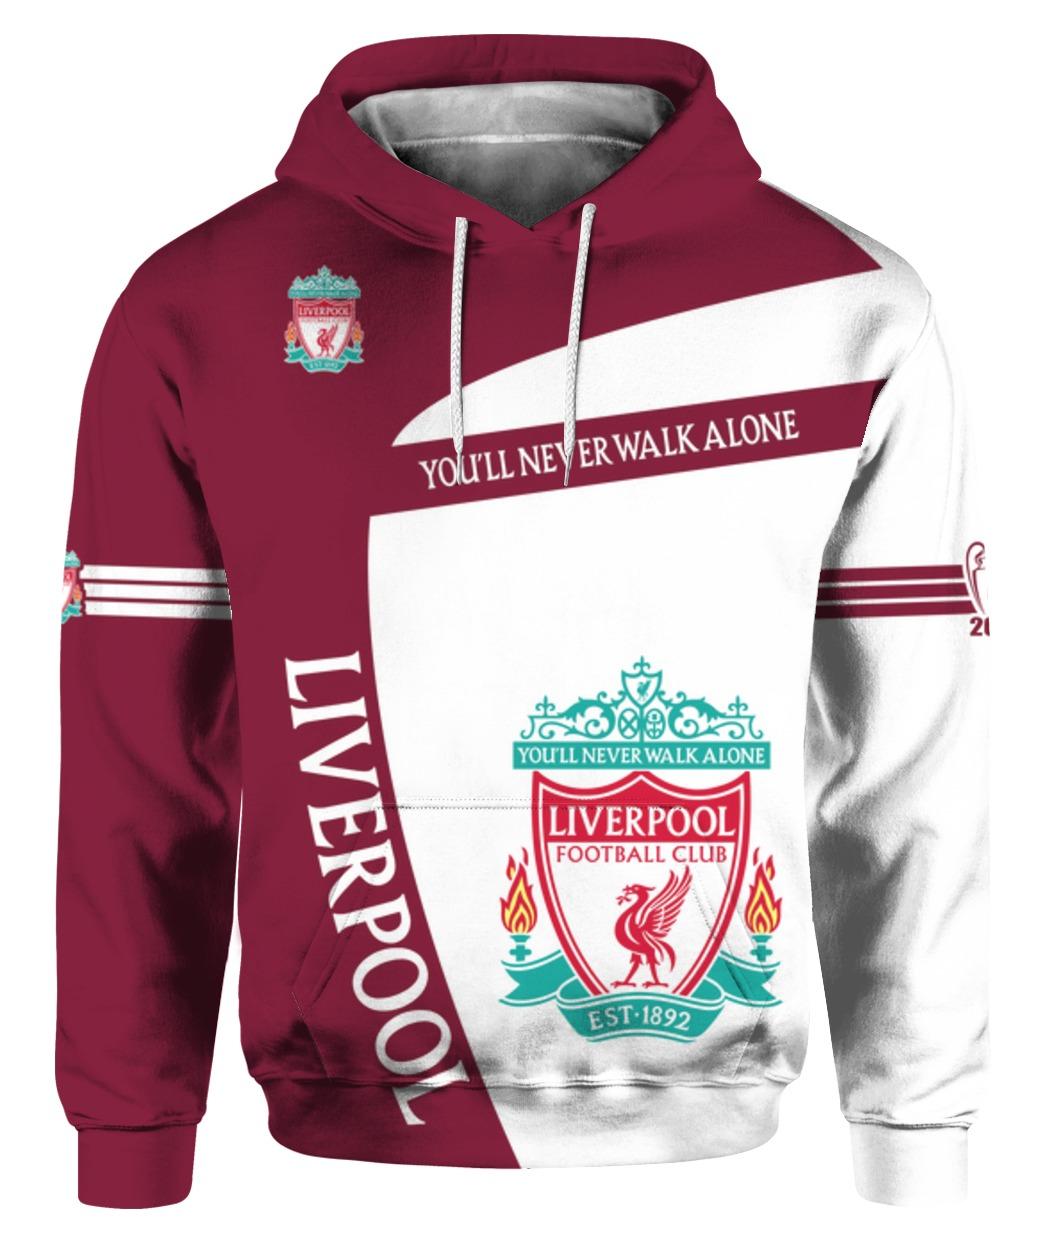 You'll never walk alone liverpool football club all over print shirt - maria